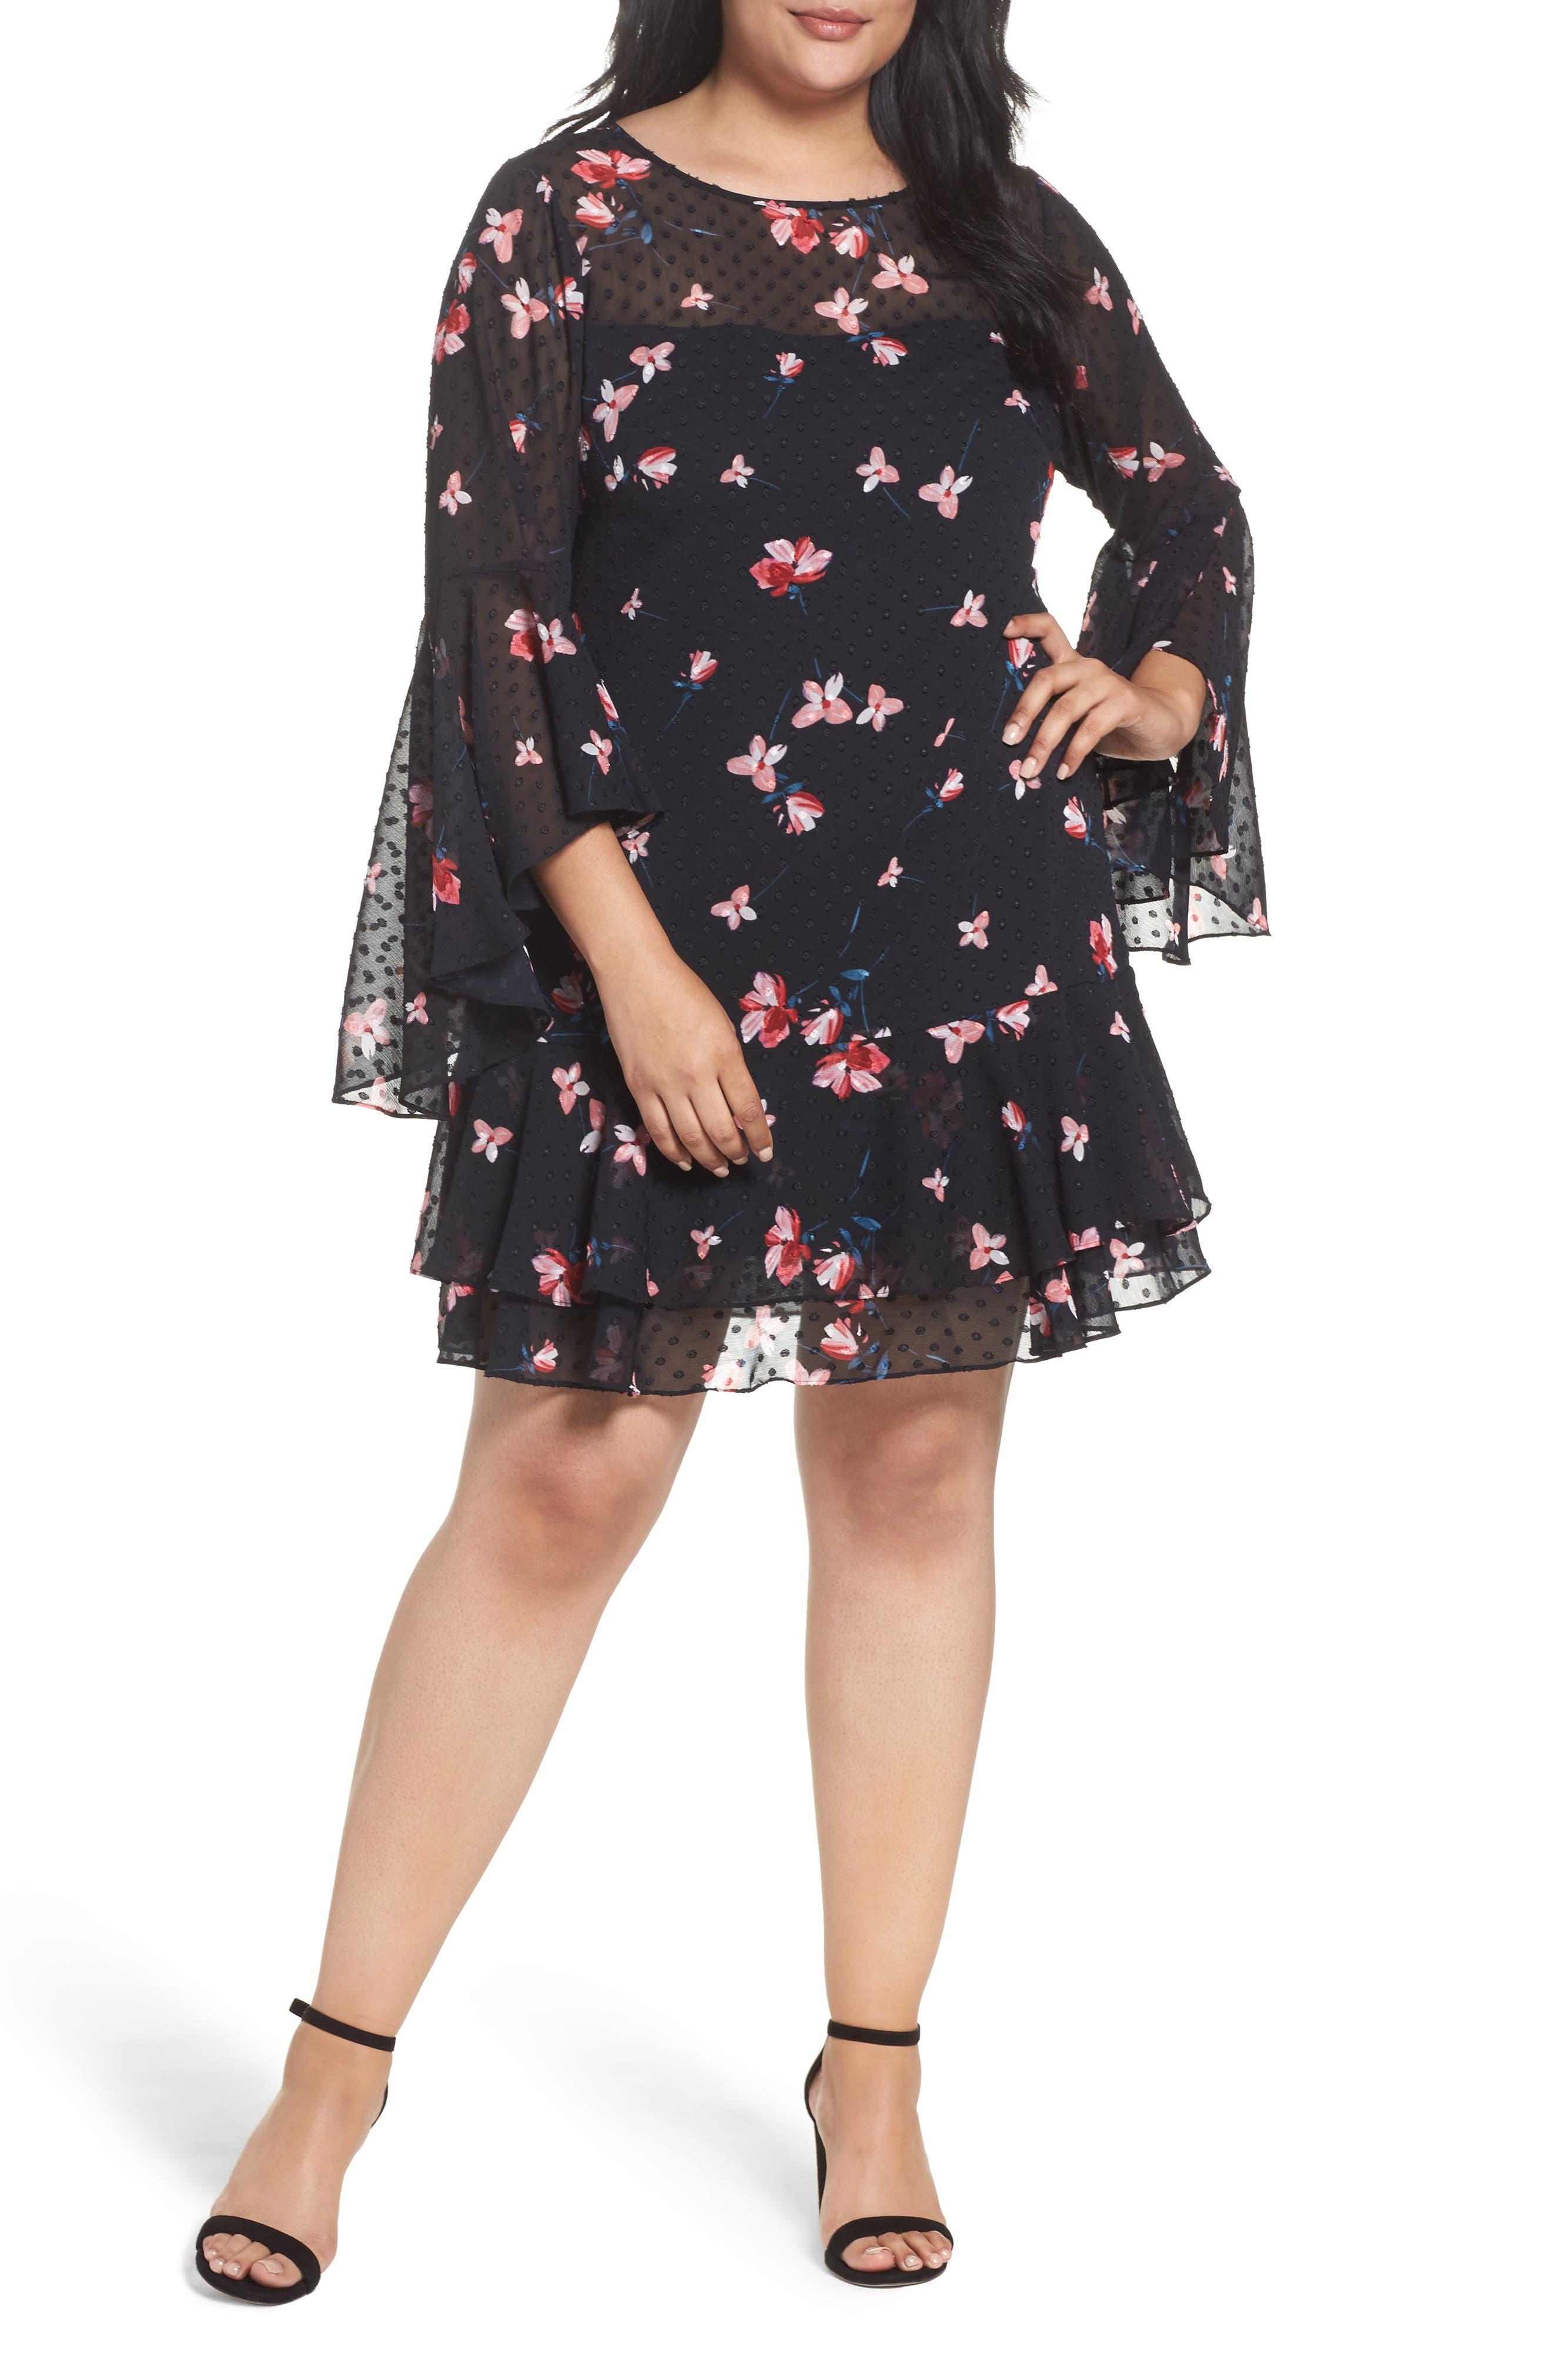 Alternate Image 1 Selected - Eliza J Ruffle Fit & Flare Dress (Plus Size)